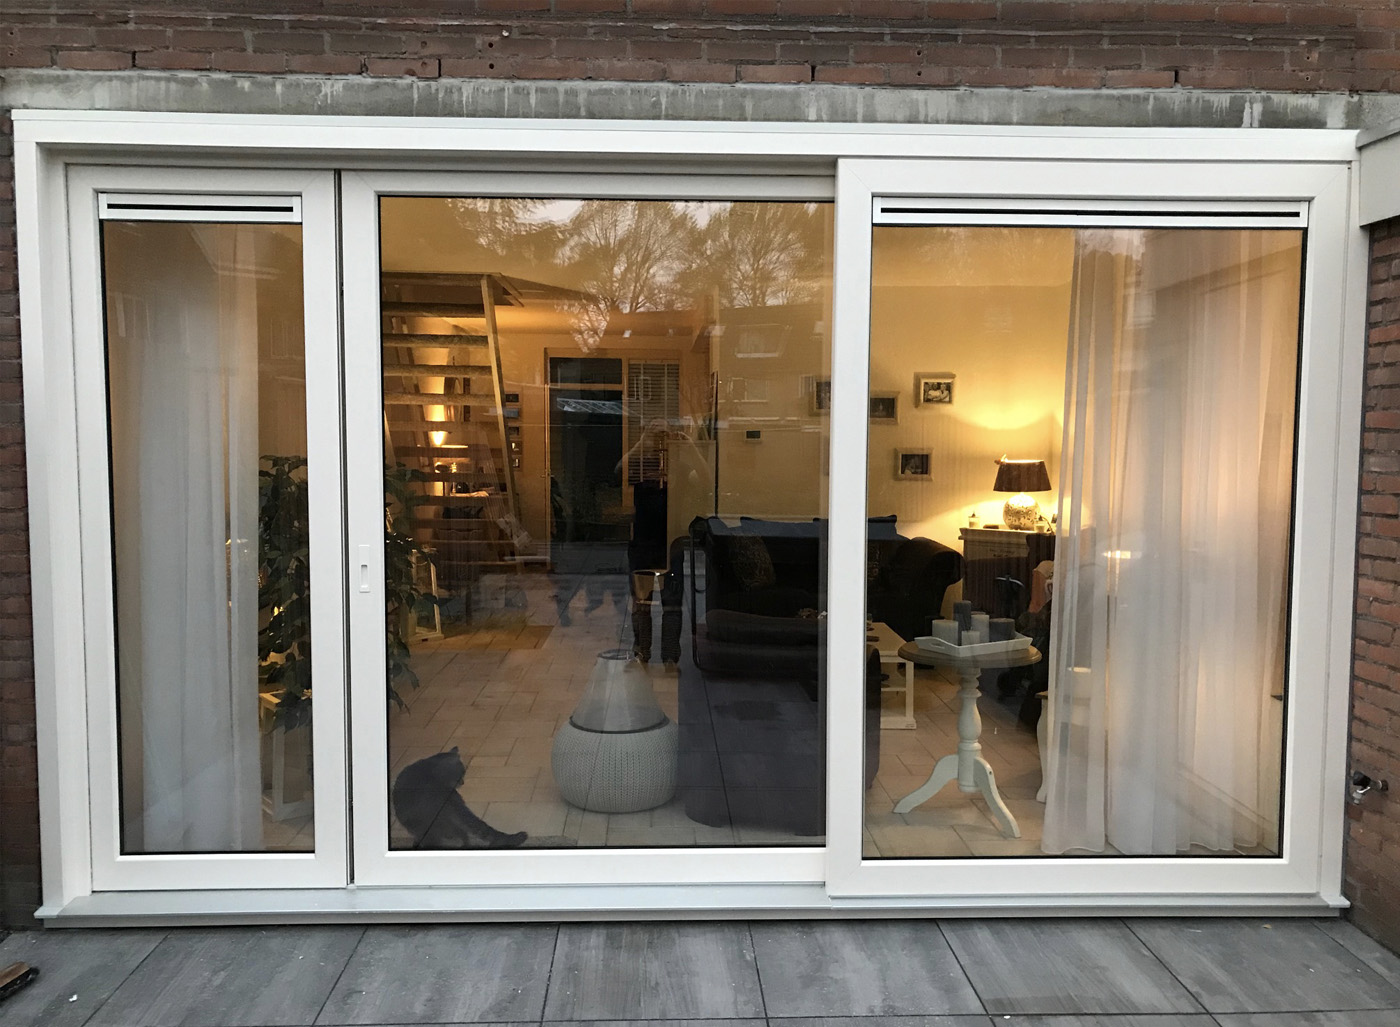 Kosten Openslaande Deuren : Openslaande deuren jordens profiteer van openslaande deuren!